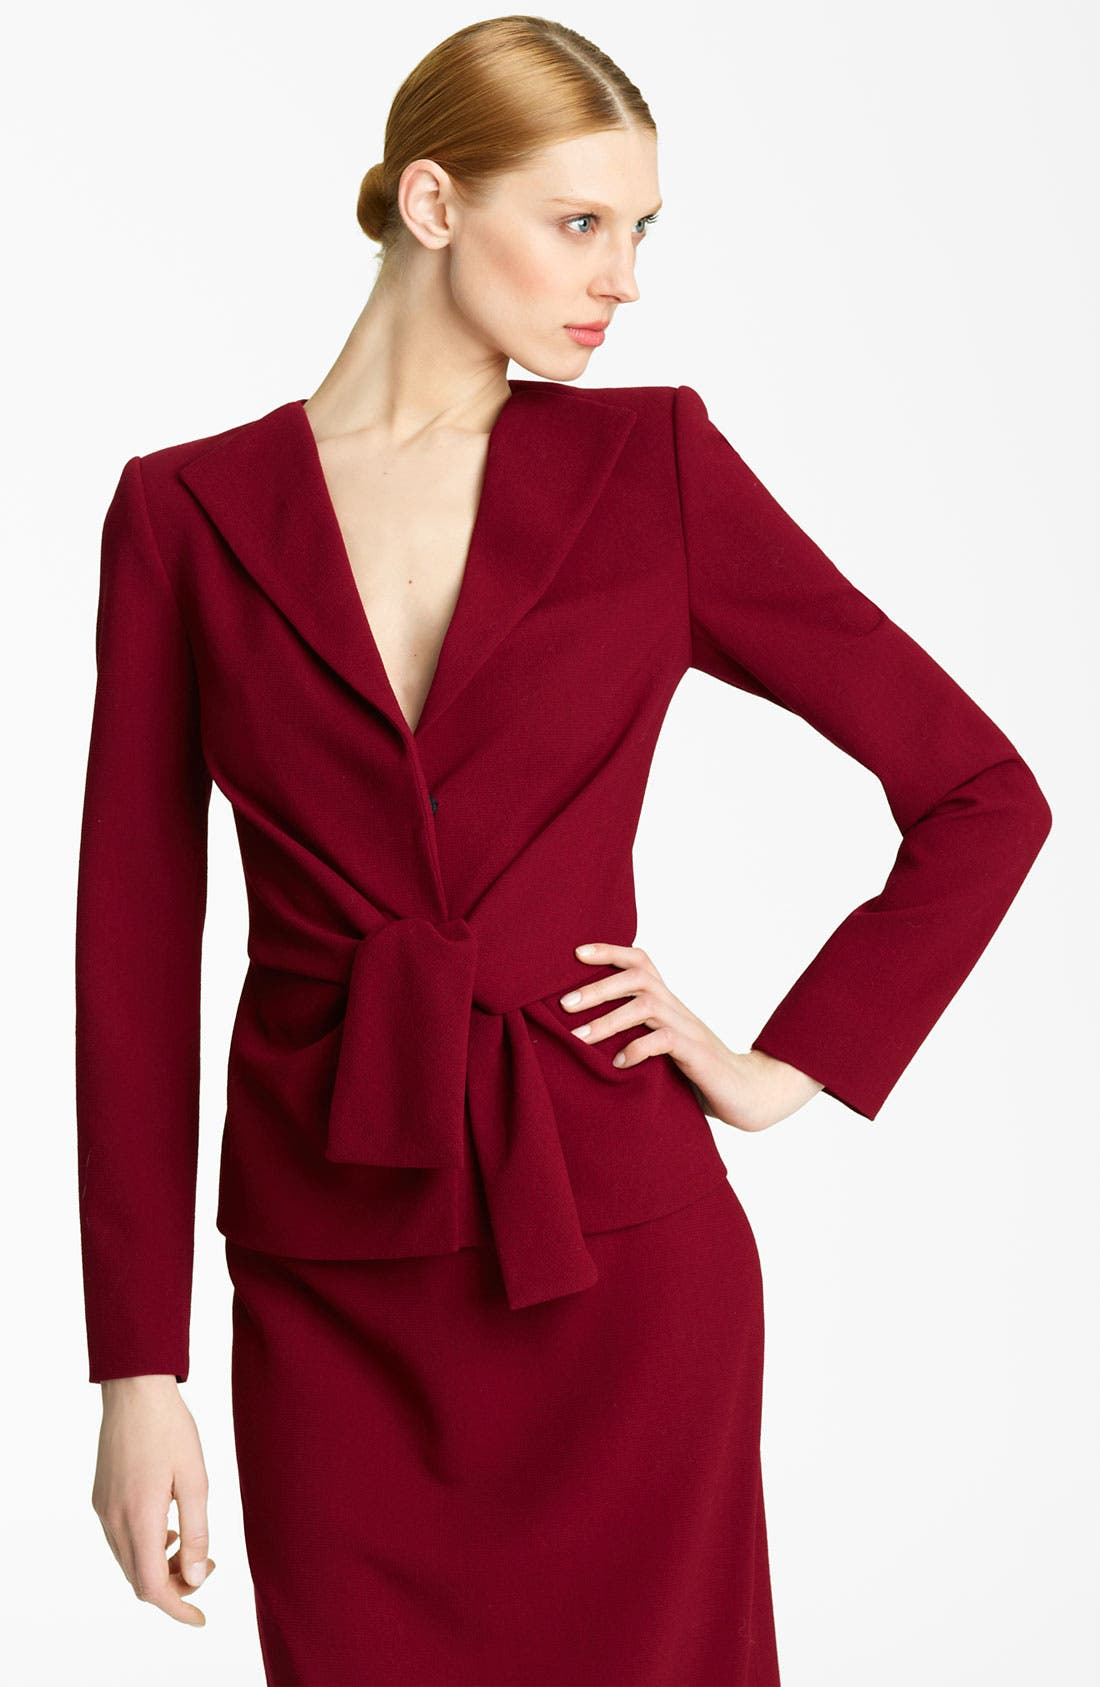 Alternate Image 1 Selected - Oscar de la Renta Tie Waist Wool Crepe Jacket